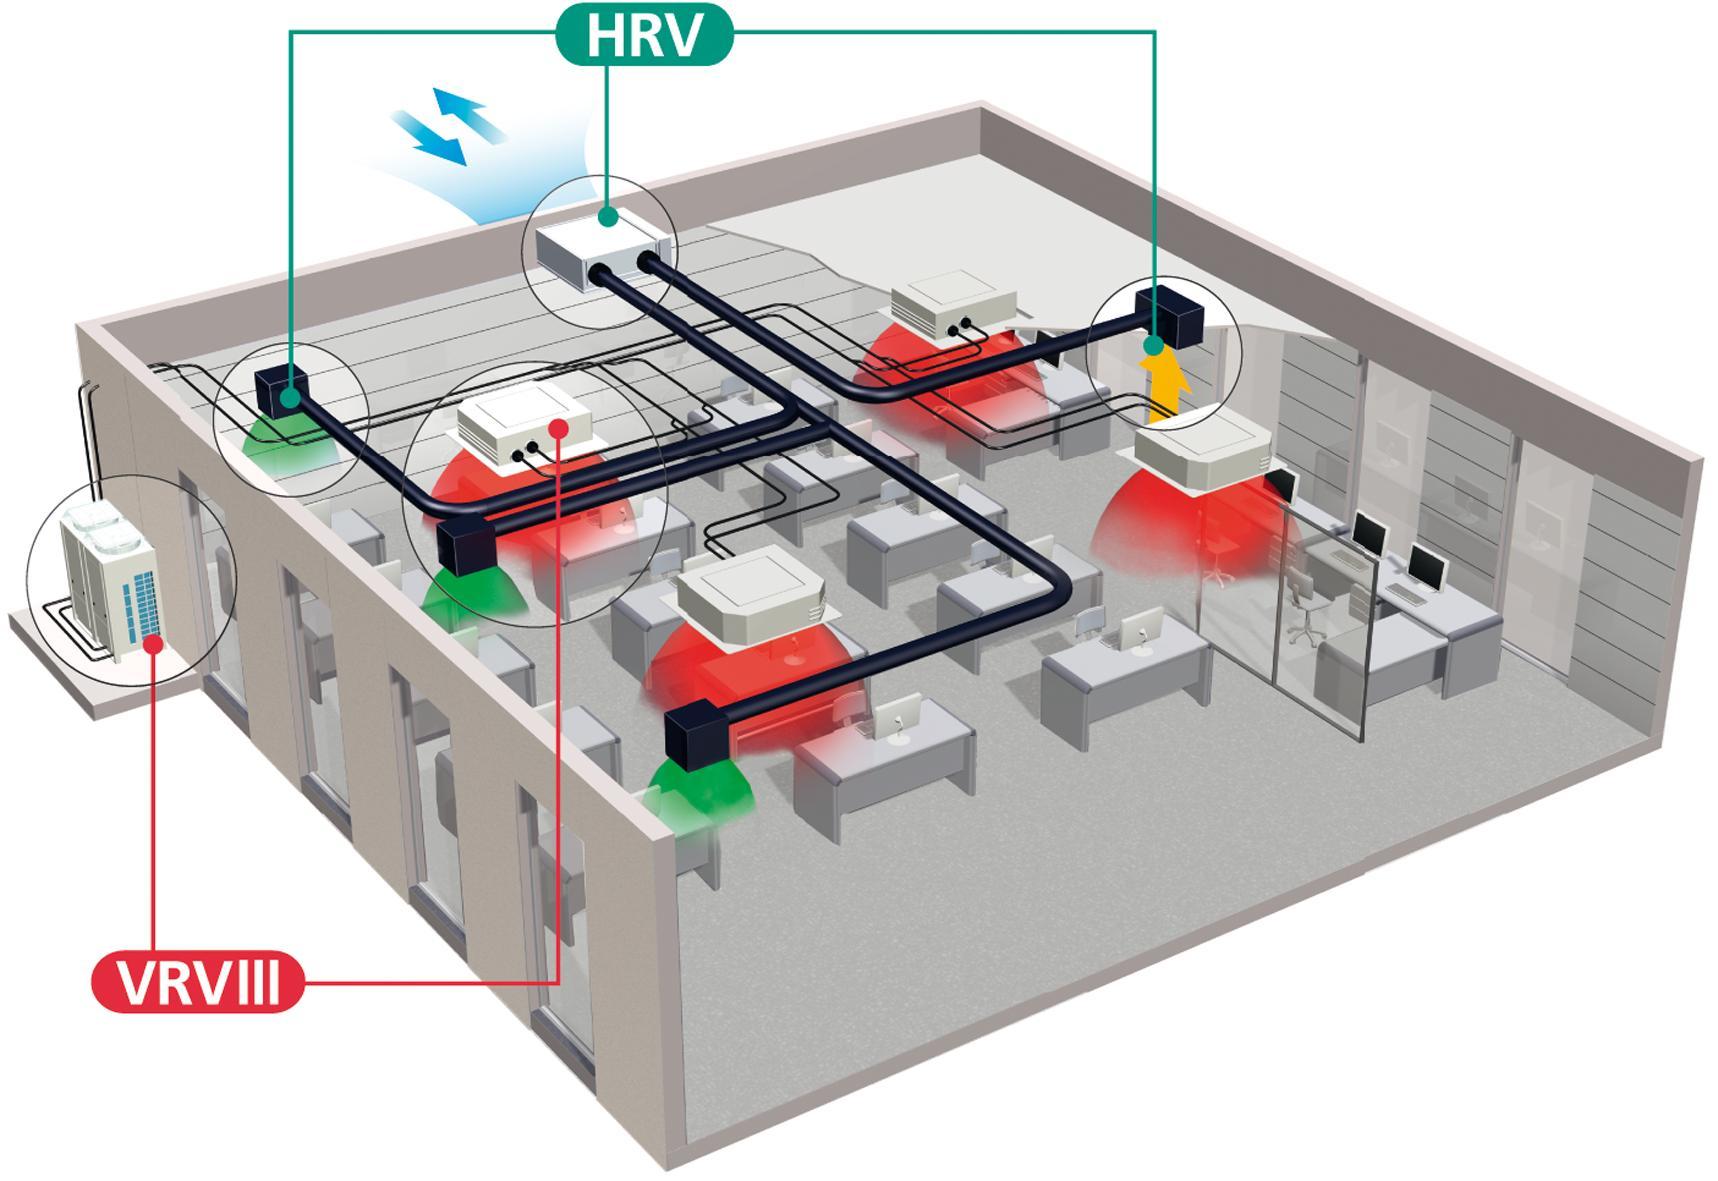 Автоматизация систем отопления и микроклимата